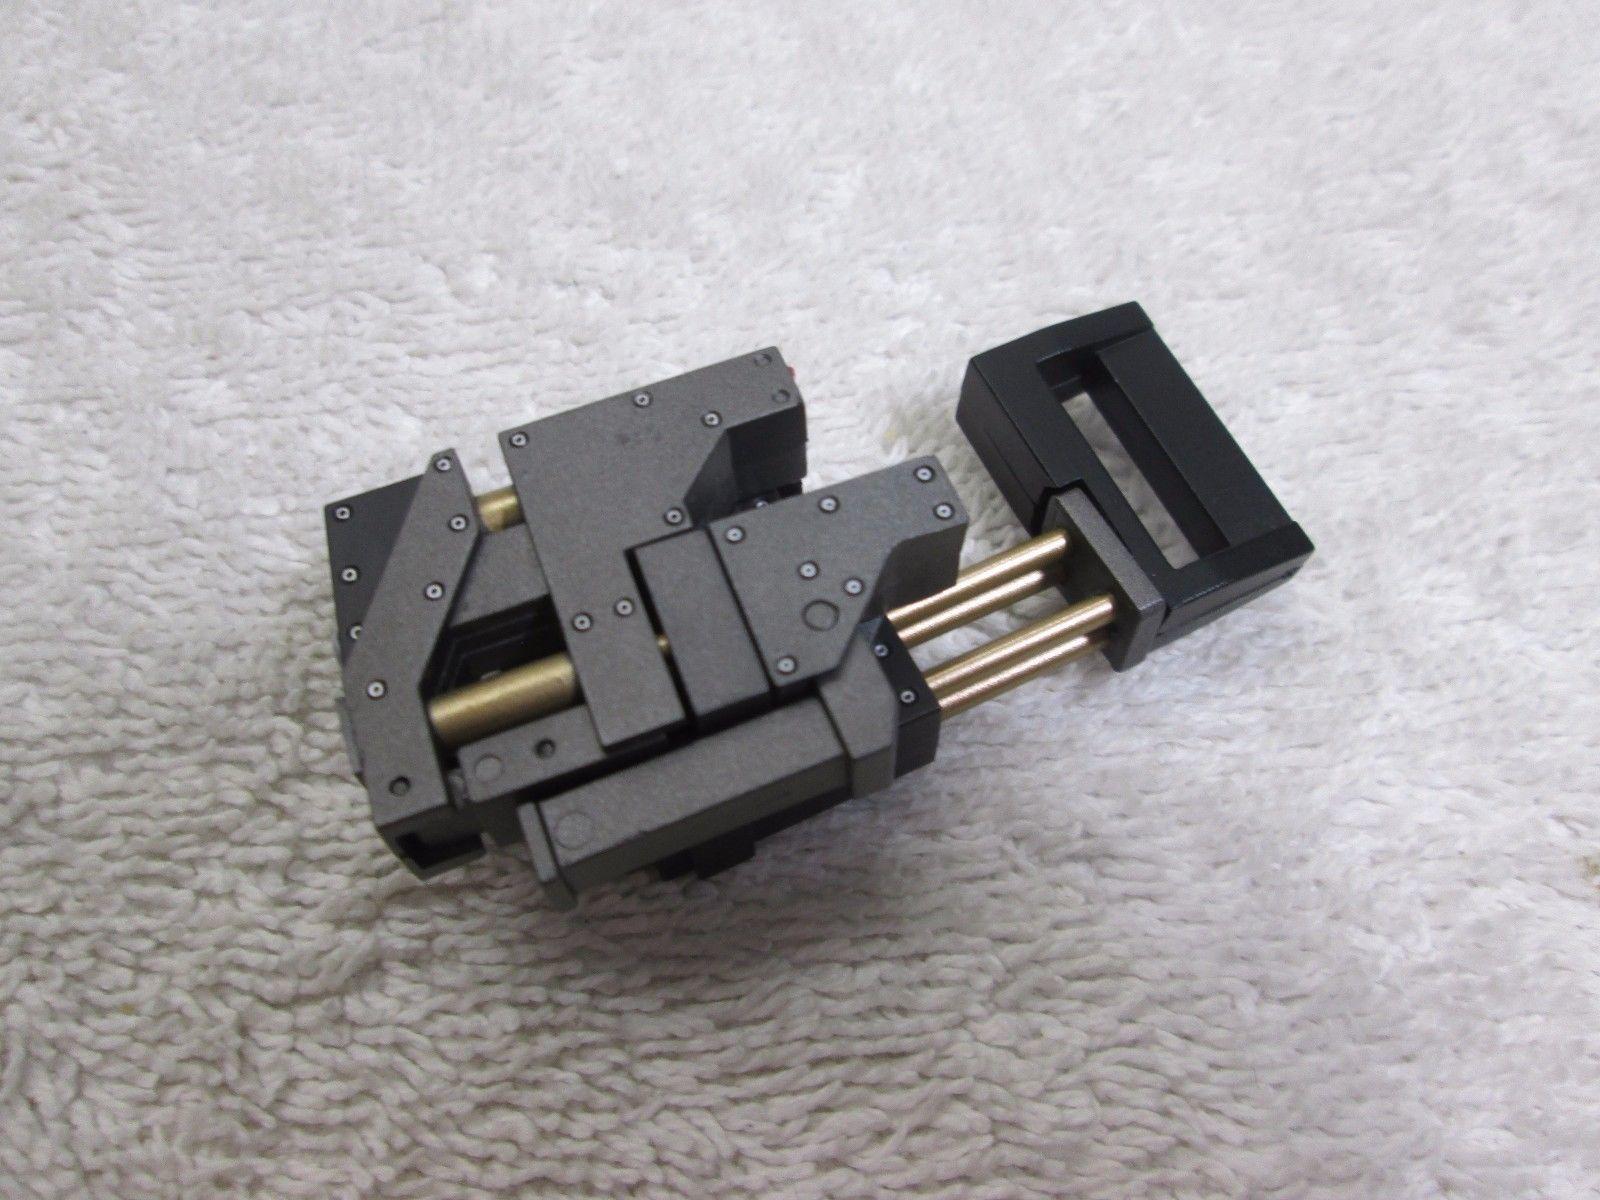 Batman Dark Knight Rises Sticky Bomb Gun DX12 1/6th Scale Accessory ~ Hot Toys